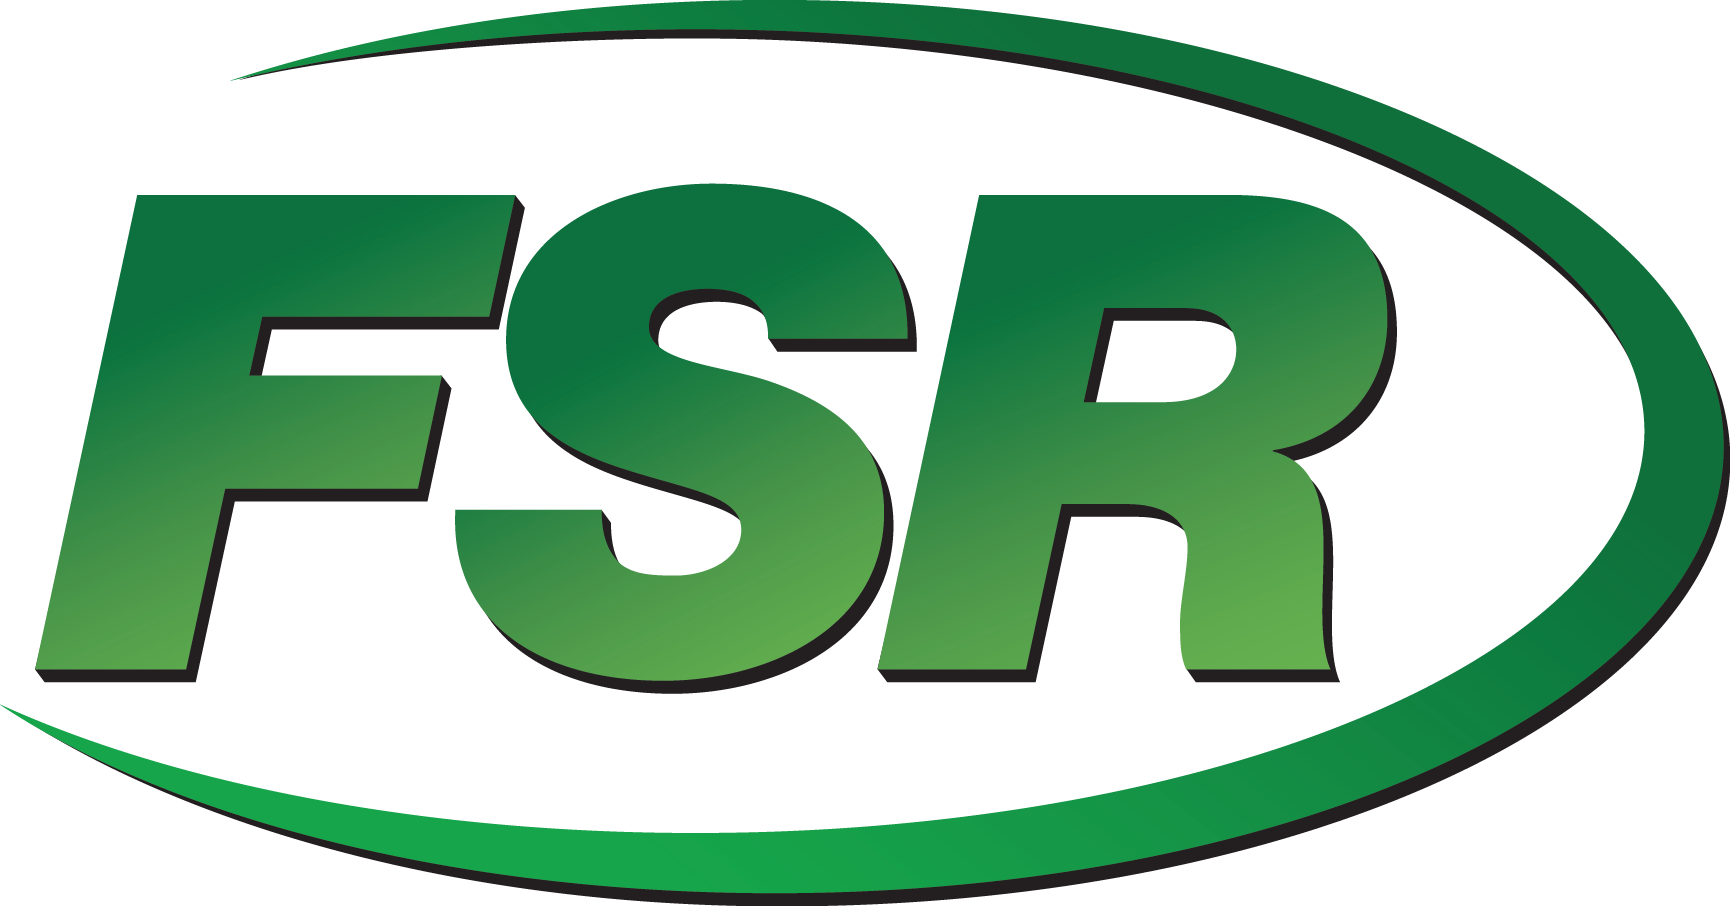 FSR logo 5-12 CMYK